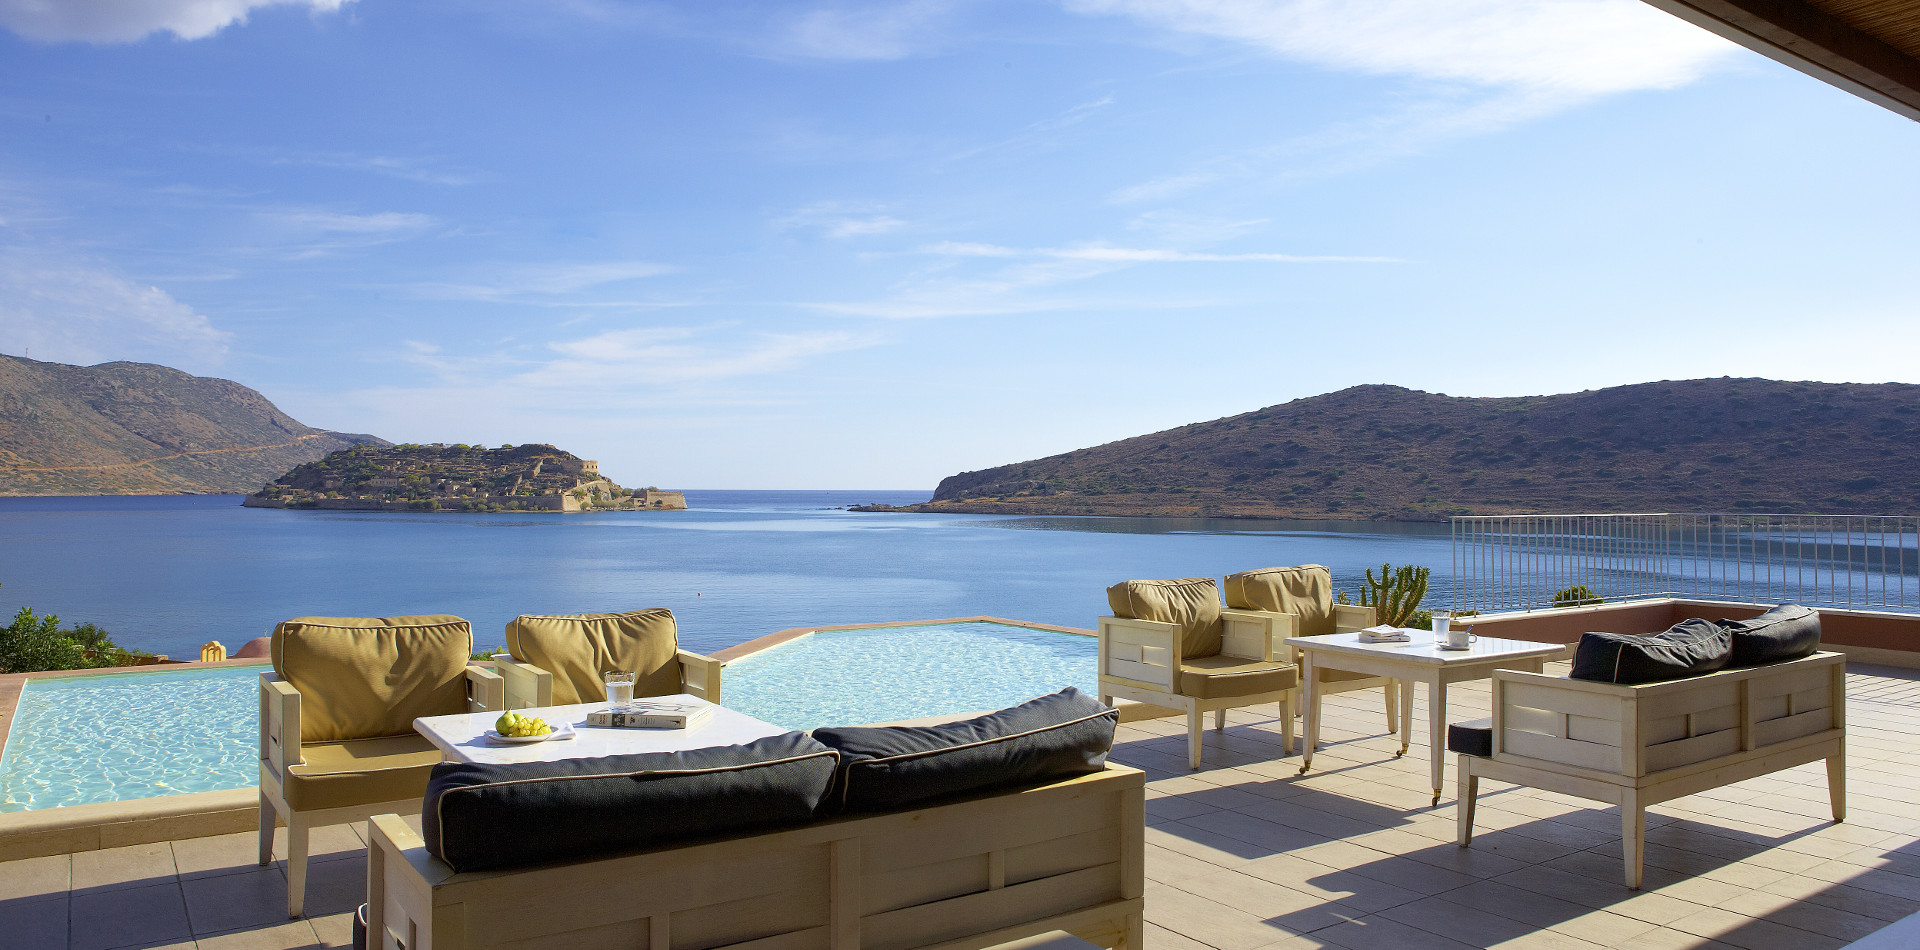 Luxusurlaub im Domes of Elounda auf Kreta